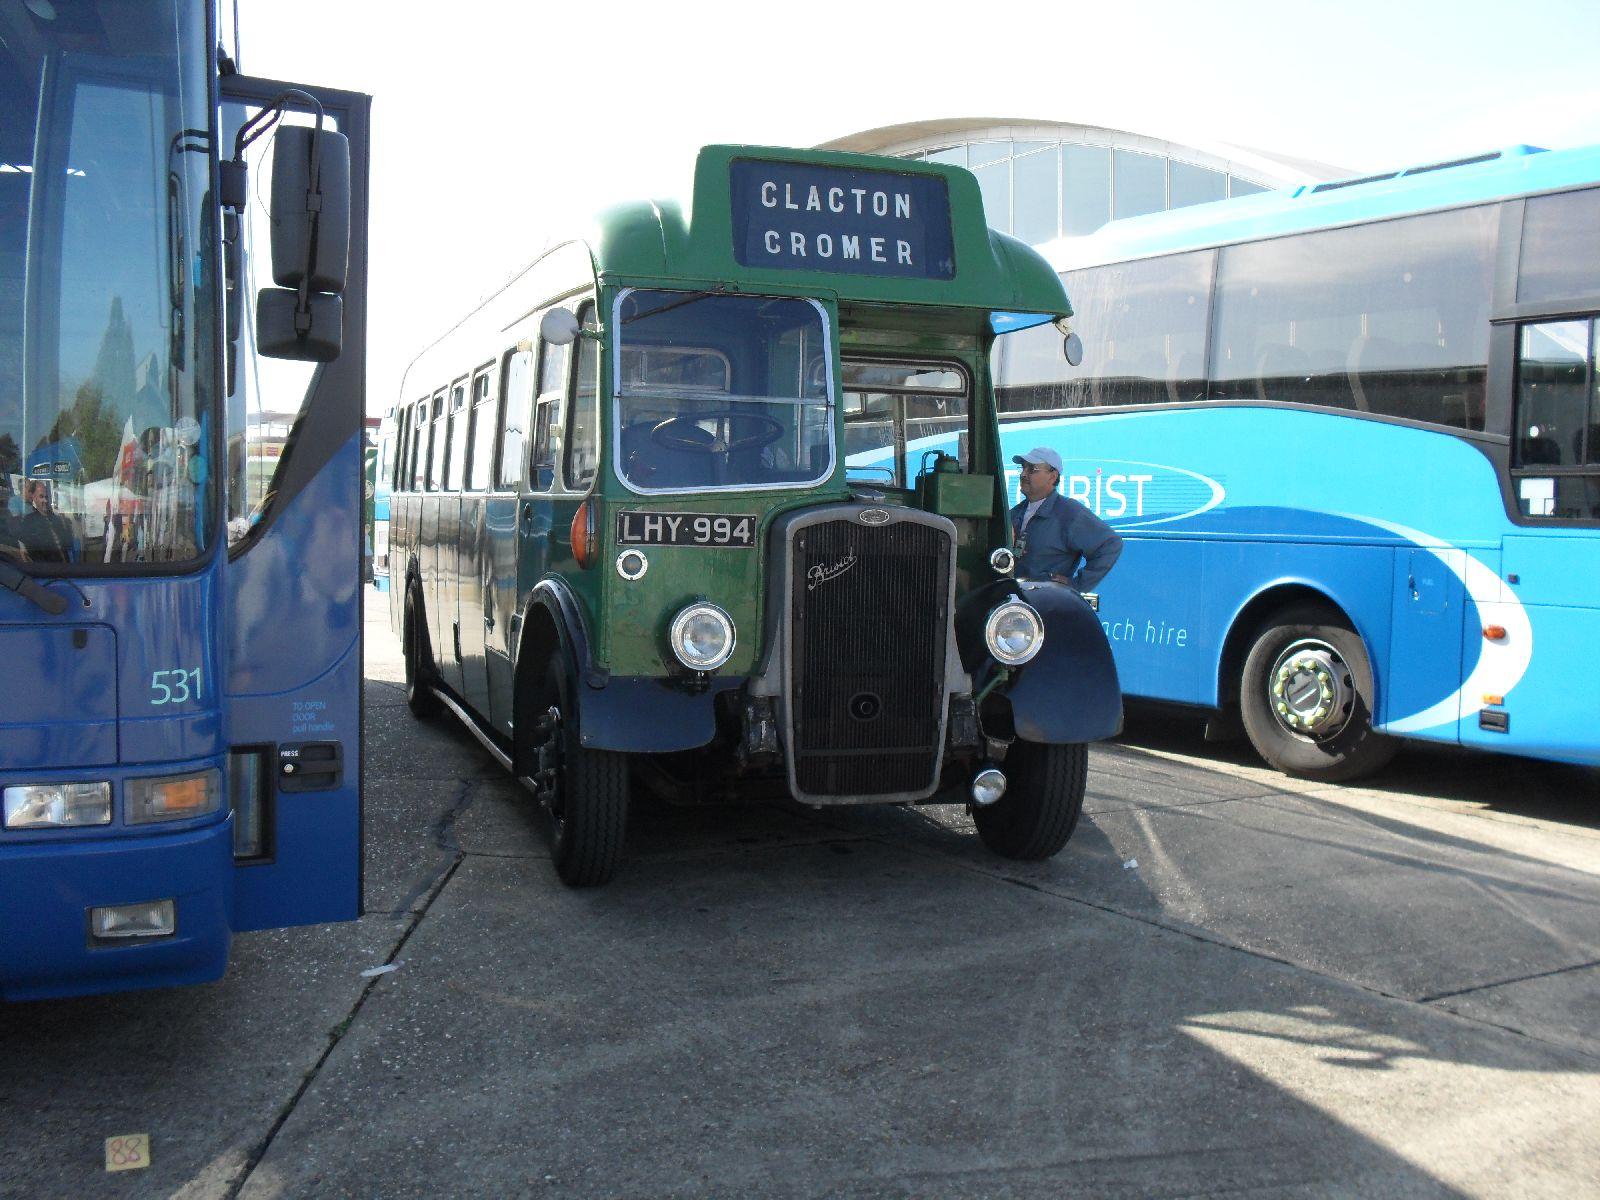 File:Bristol Omnibus bus 2447 (LHY 994), Showbus rally 2009.jpg